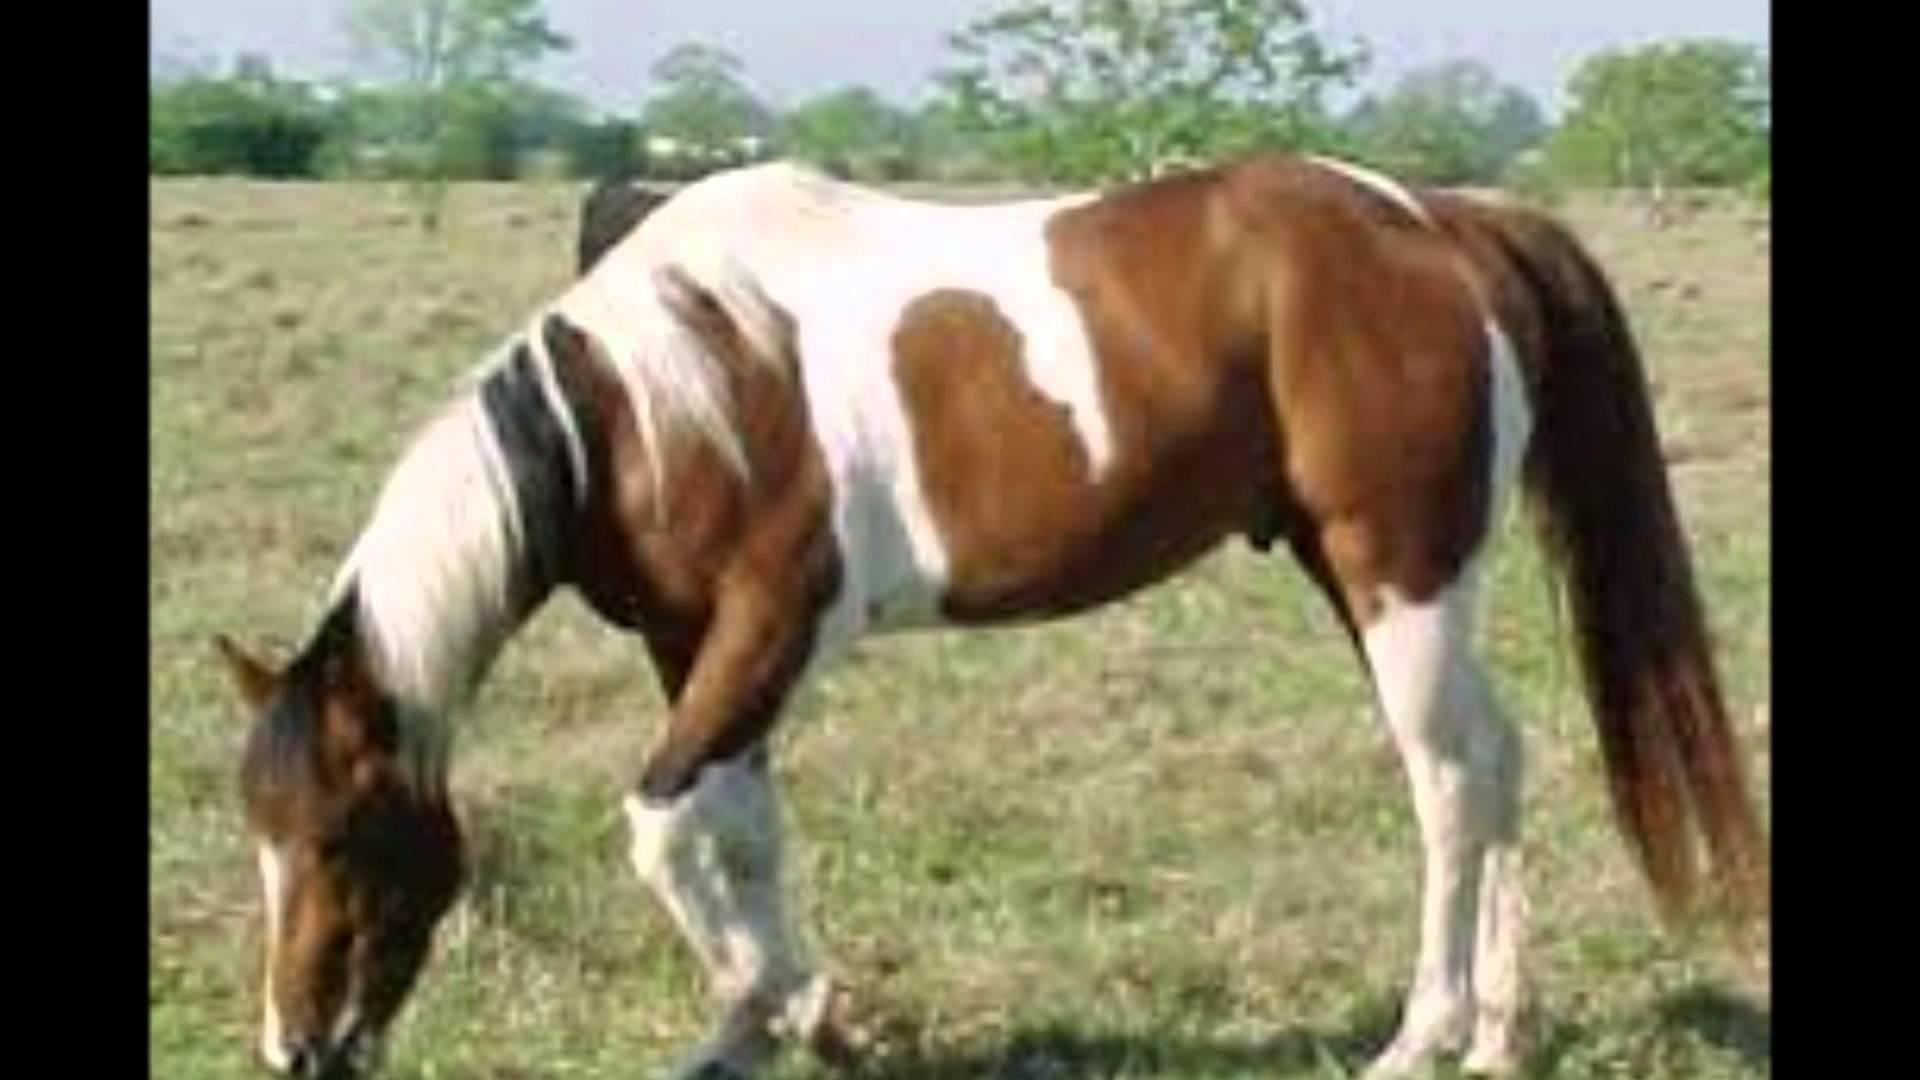 بالصور صور احصنه , اروع صور احصنة طبيعيه 1507 7